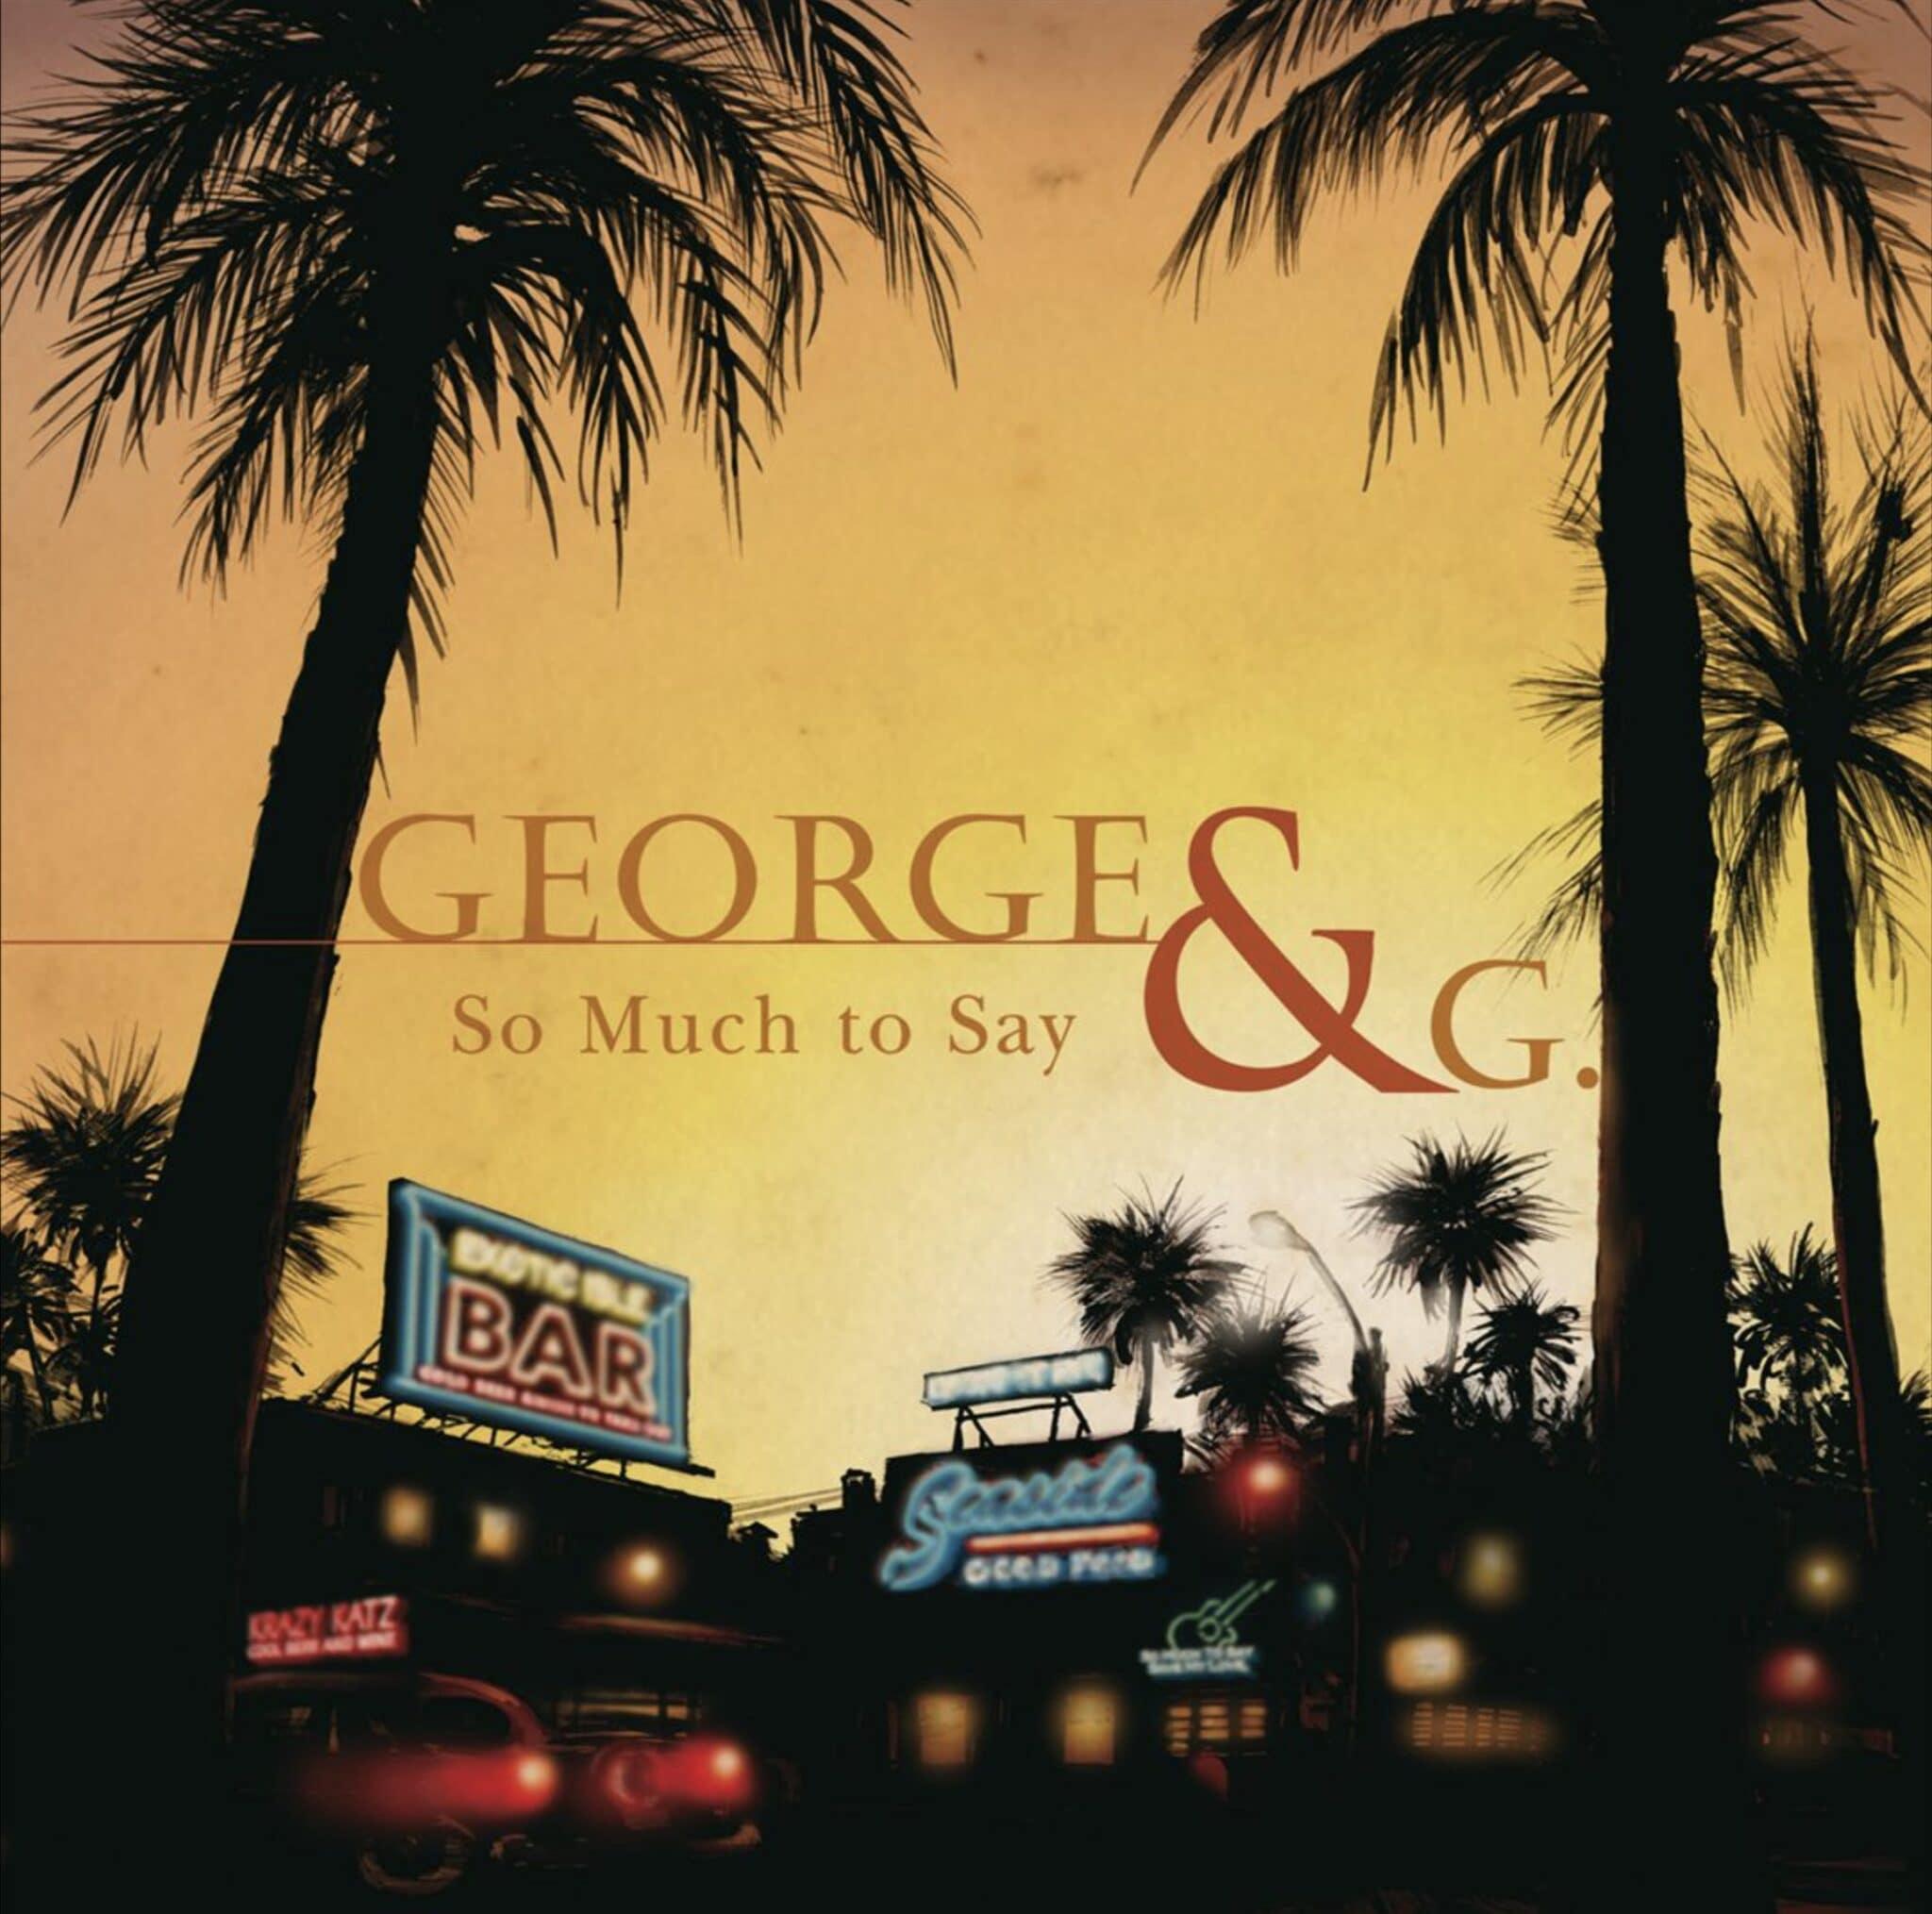 GeorgeG